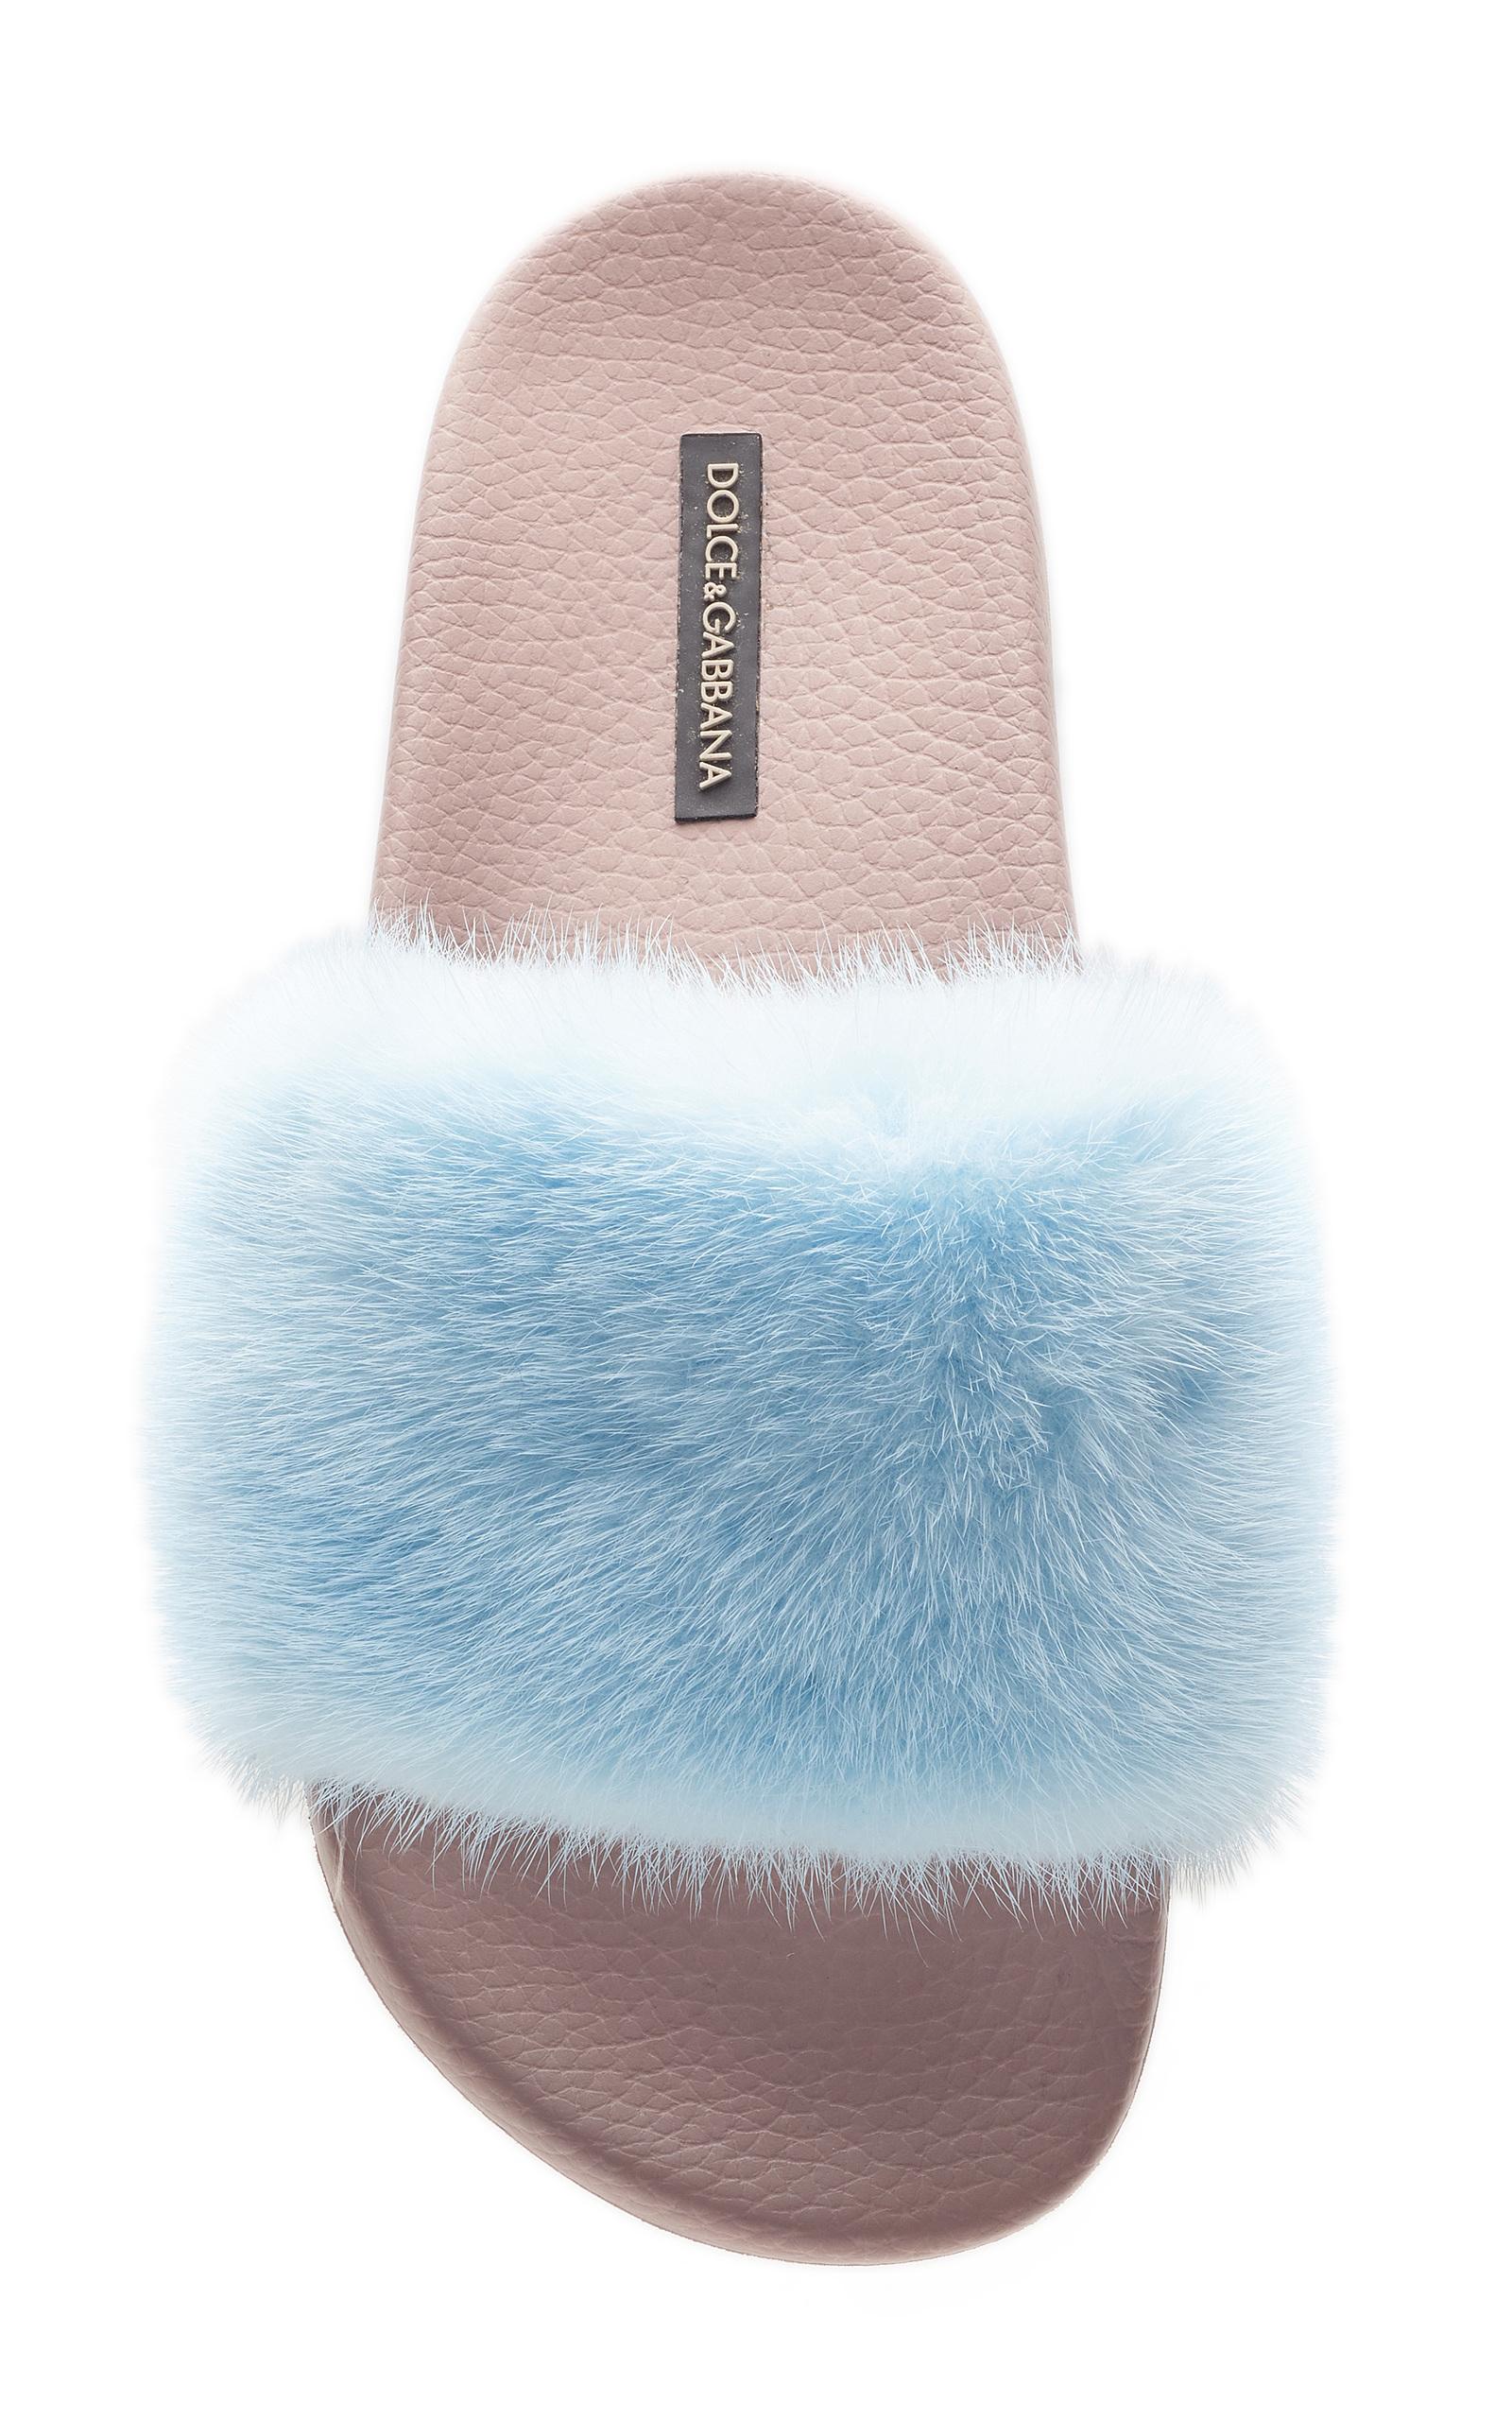 Dolce & Gabbana Fur slides low price fee shipping cheap price low price fee shipping for sale VlCf1L9c0